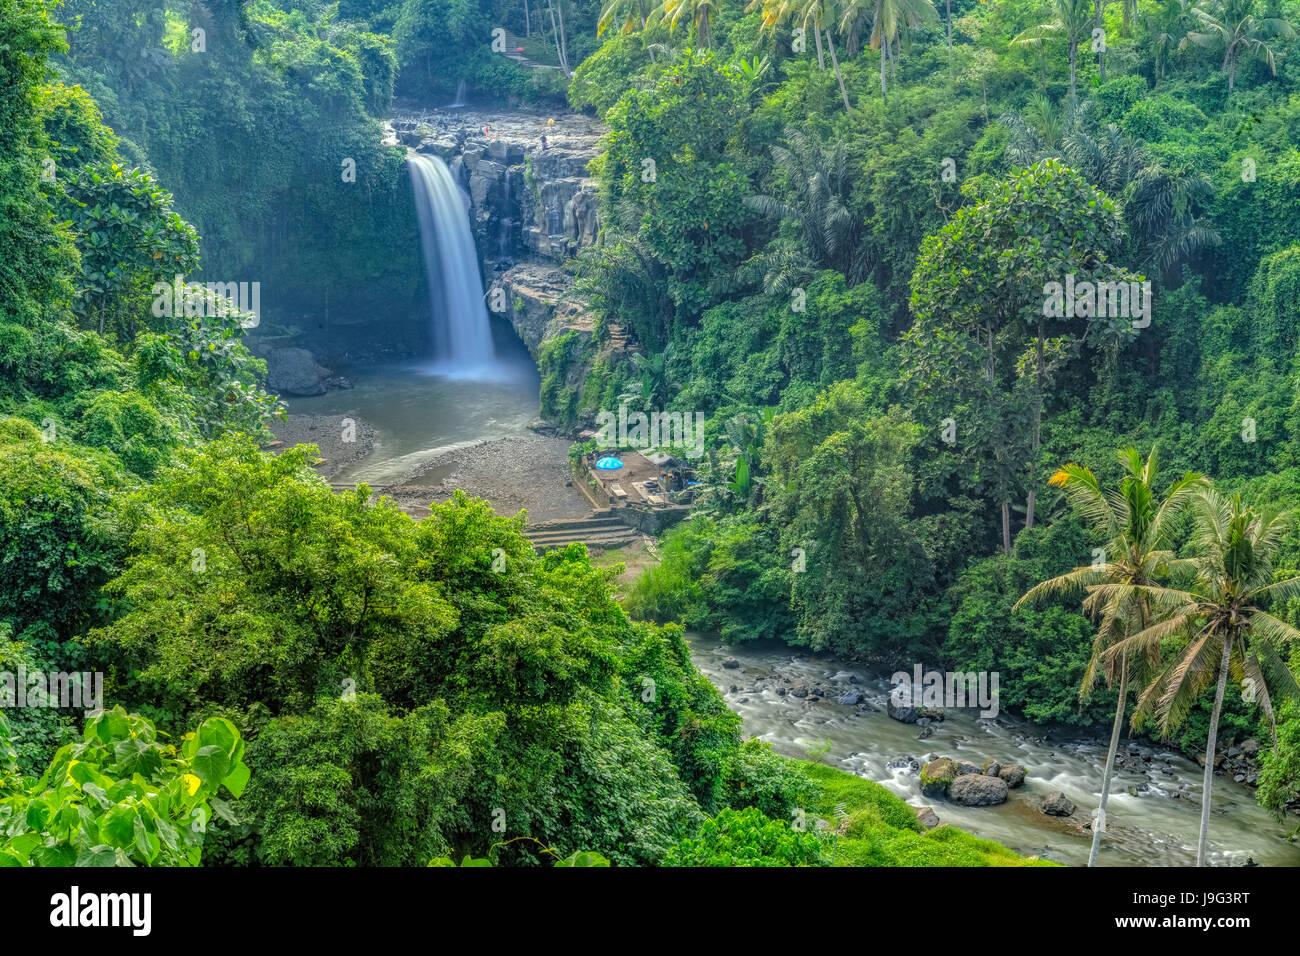 Terjun Blangsinga Waterfall, Ubud, Bali, Indonesia, Asia - Stock Image